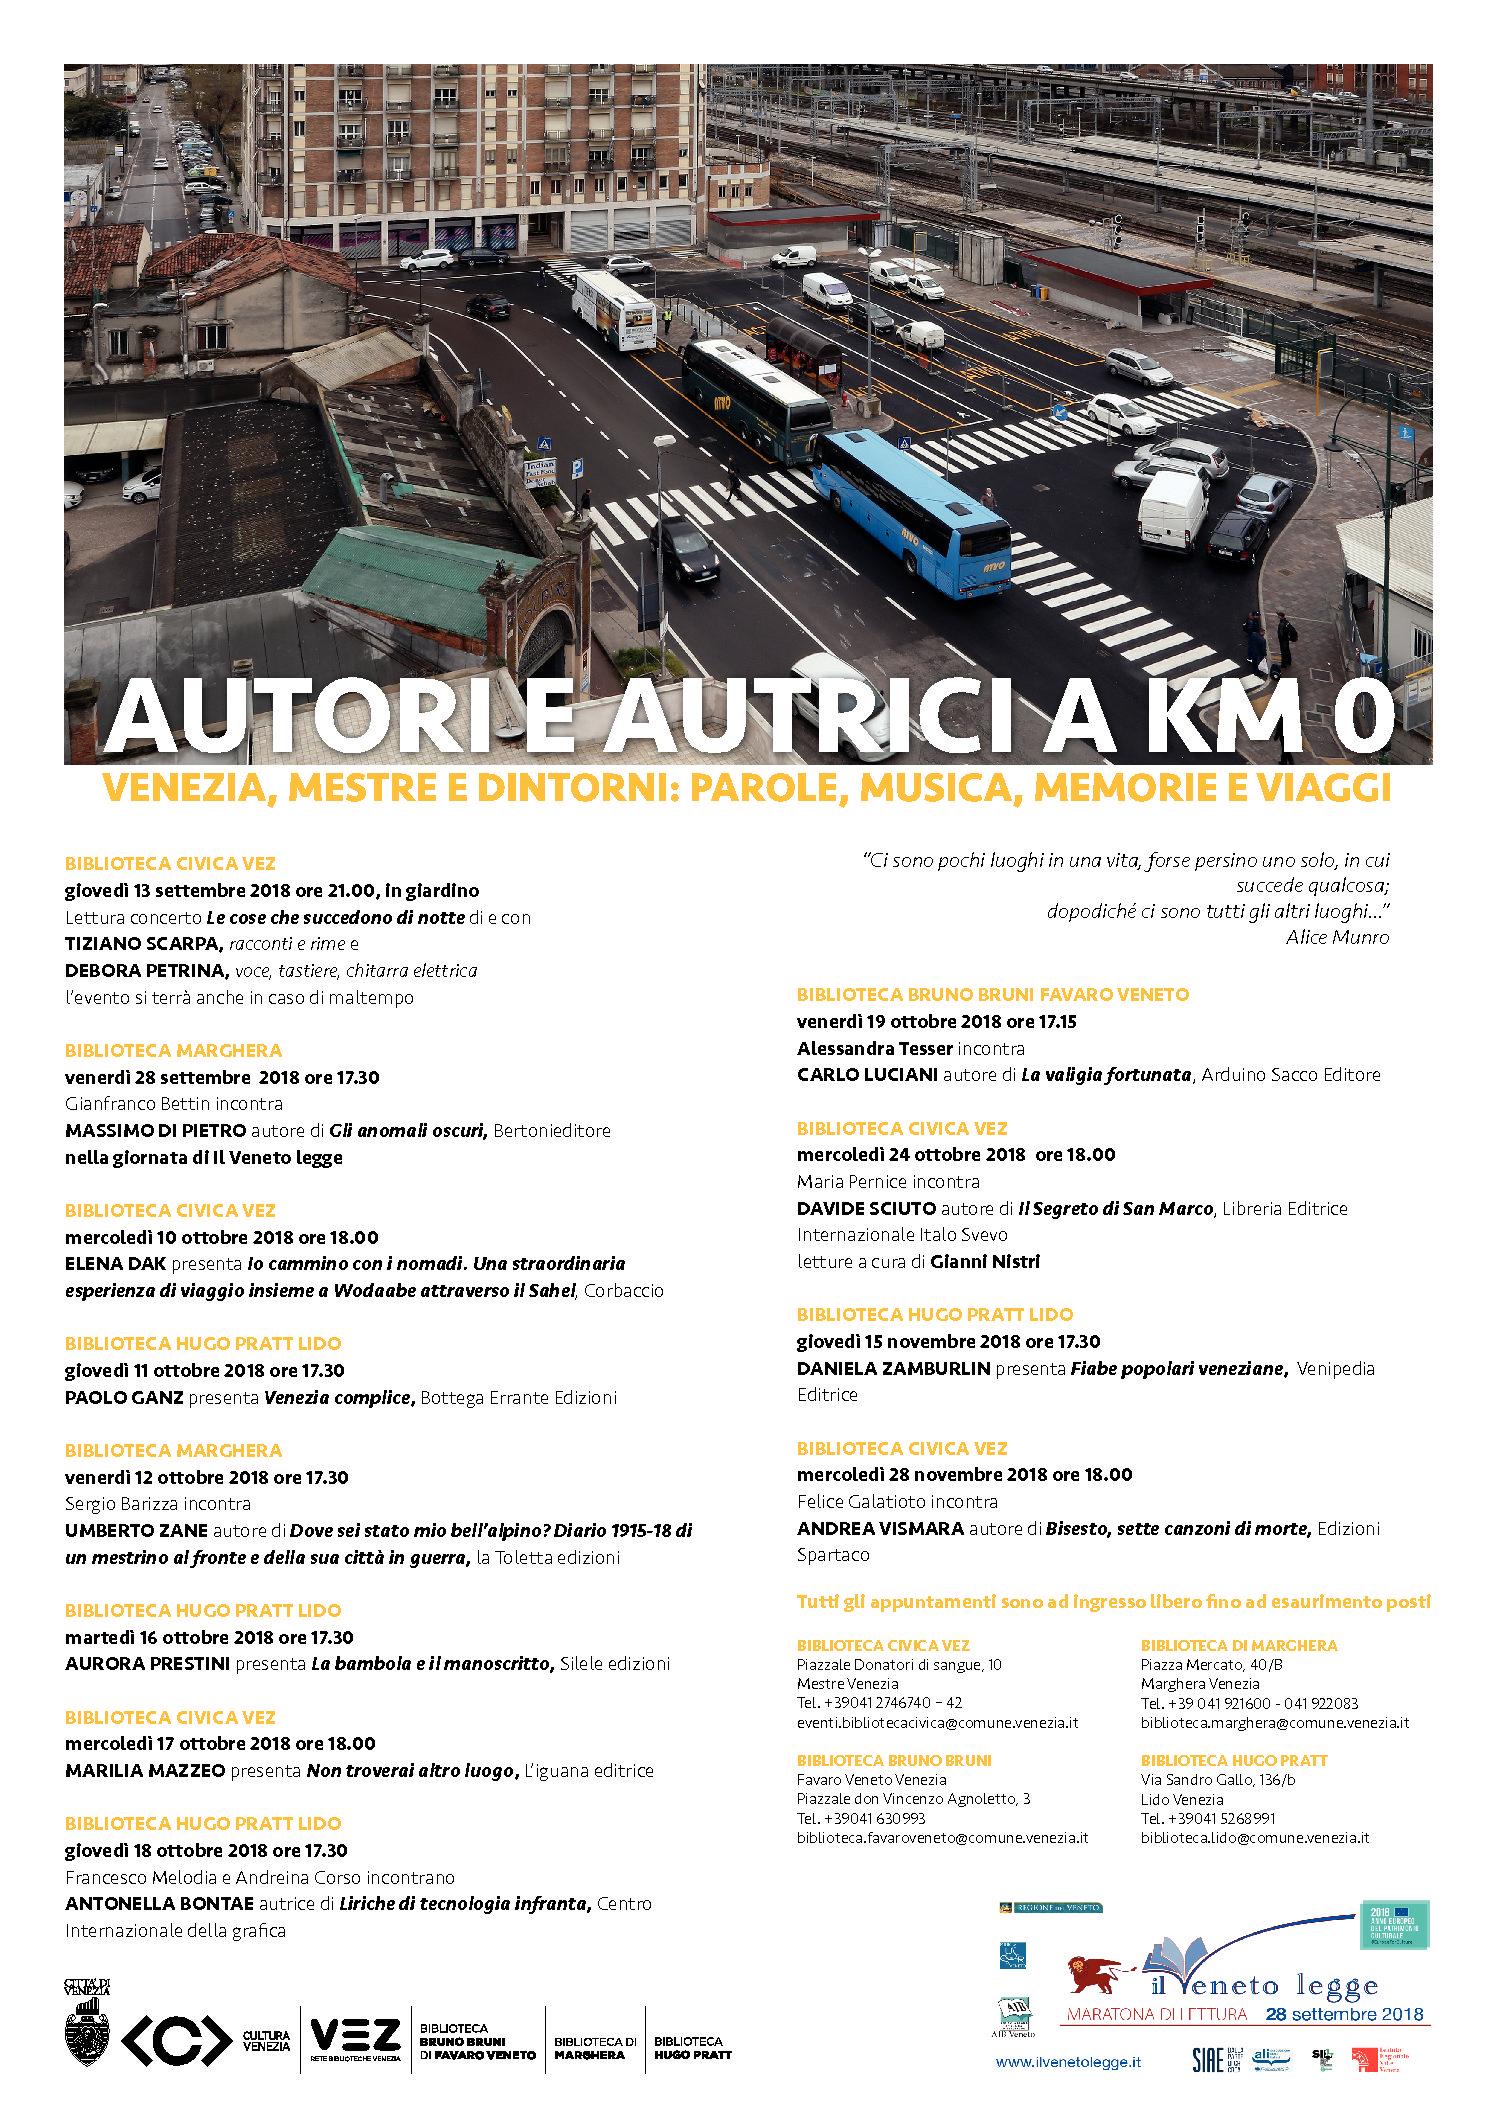 http://www.societadelleletterate.it/wp-content/uploads/2018/10/Locandina-A3-Autori-Autrici-pdf.jpg